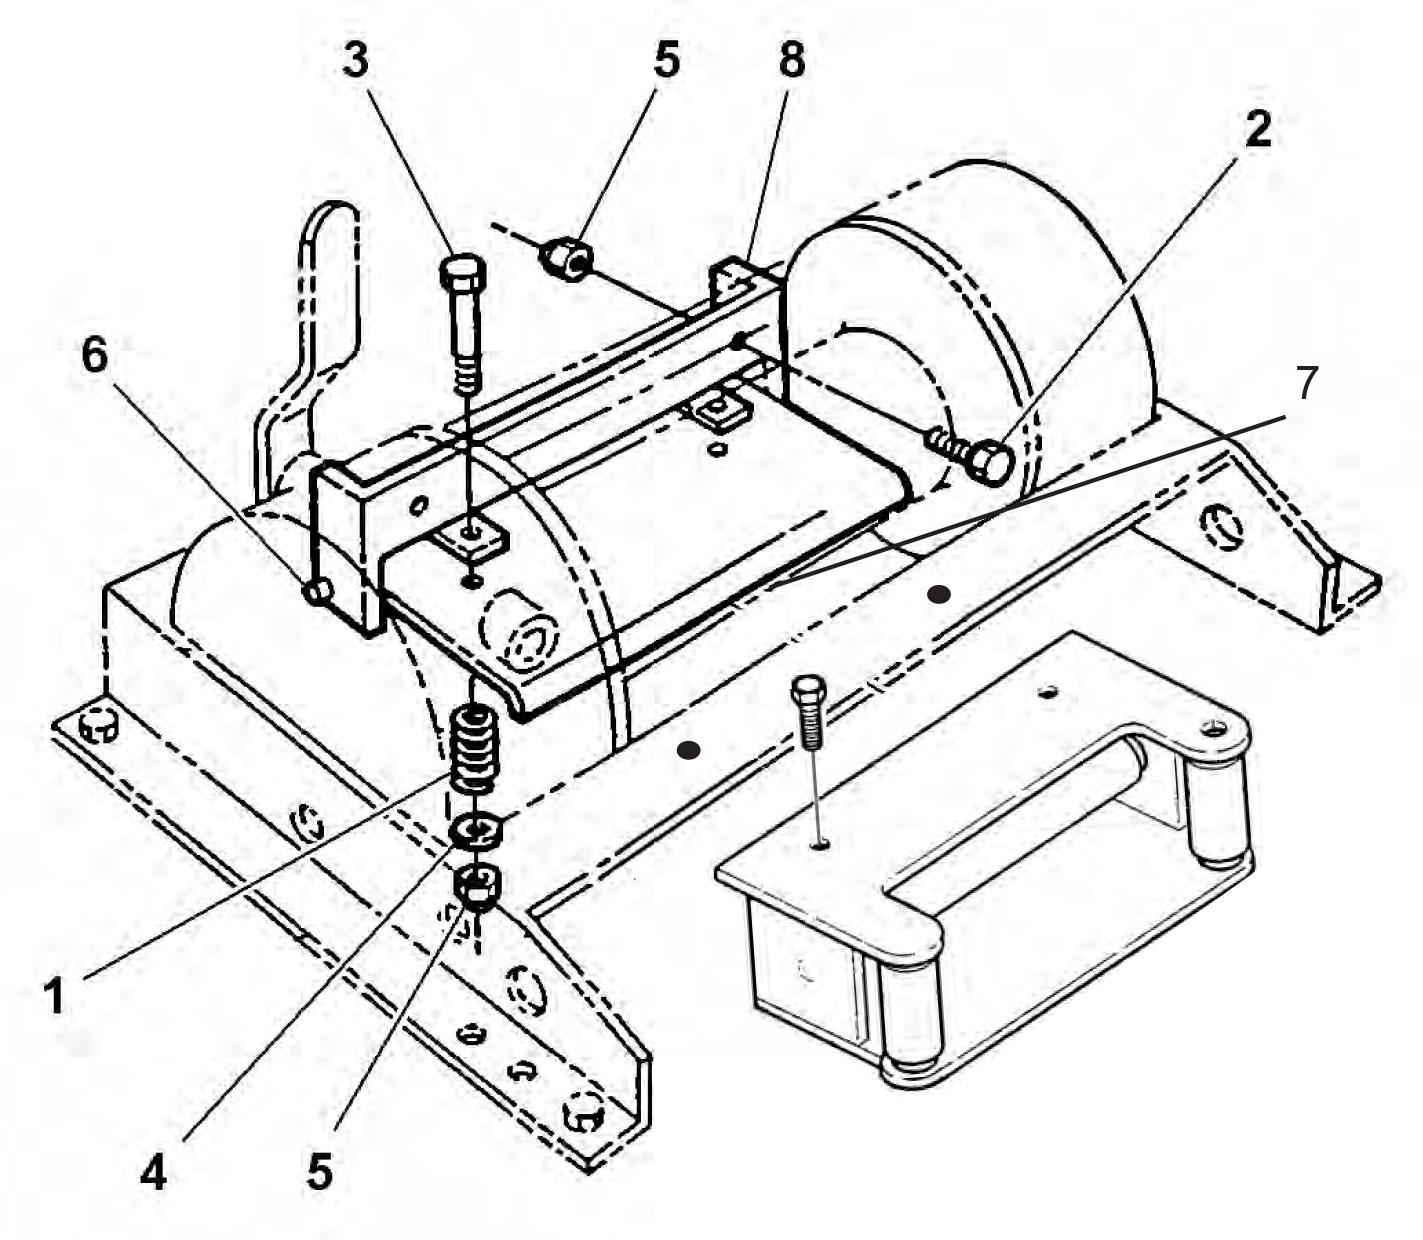 Superwinch Lt2500 Wiring Diagram Trusted Diagrams Old Fashioned Warn Winch M12000 Motif Atv 1500